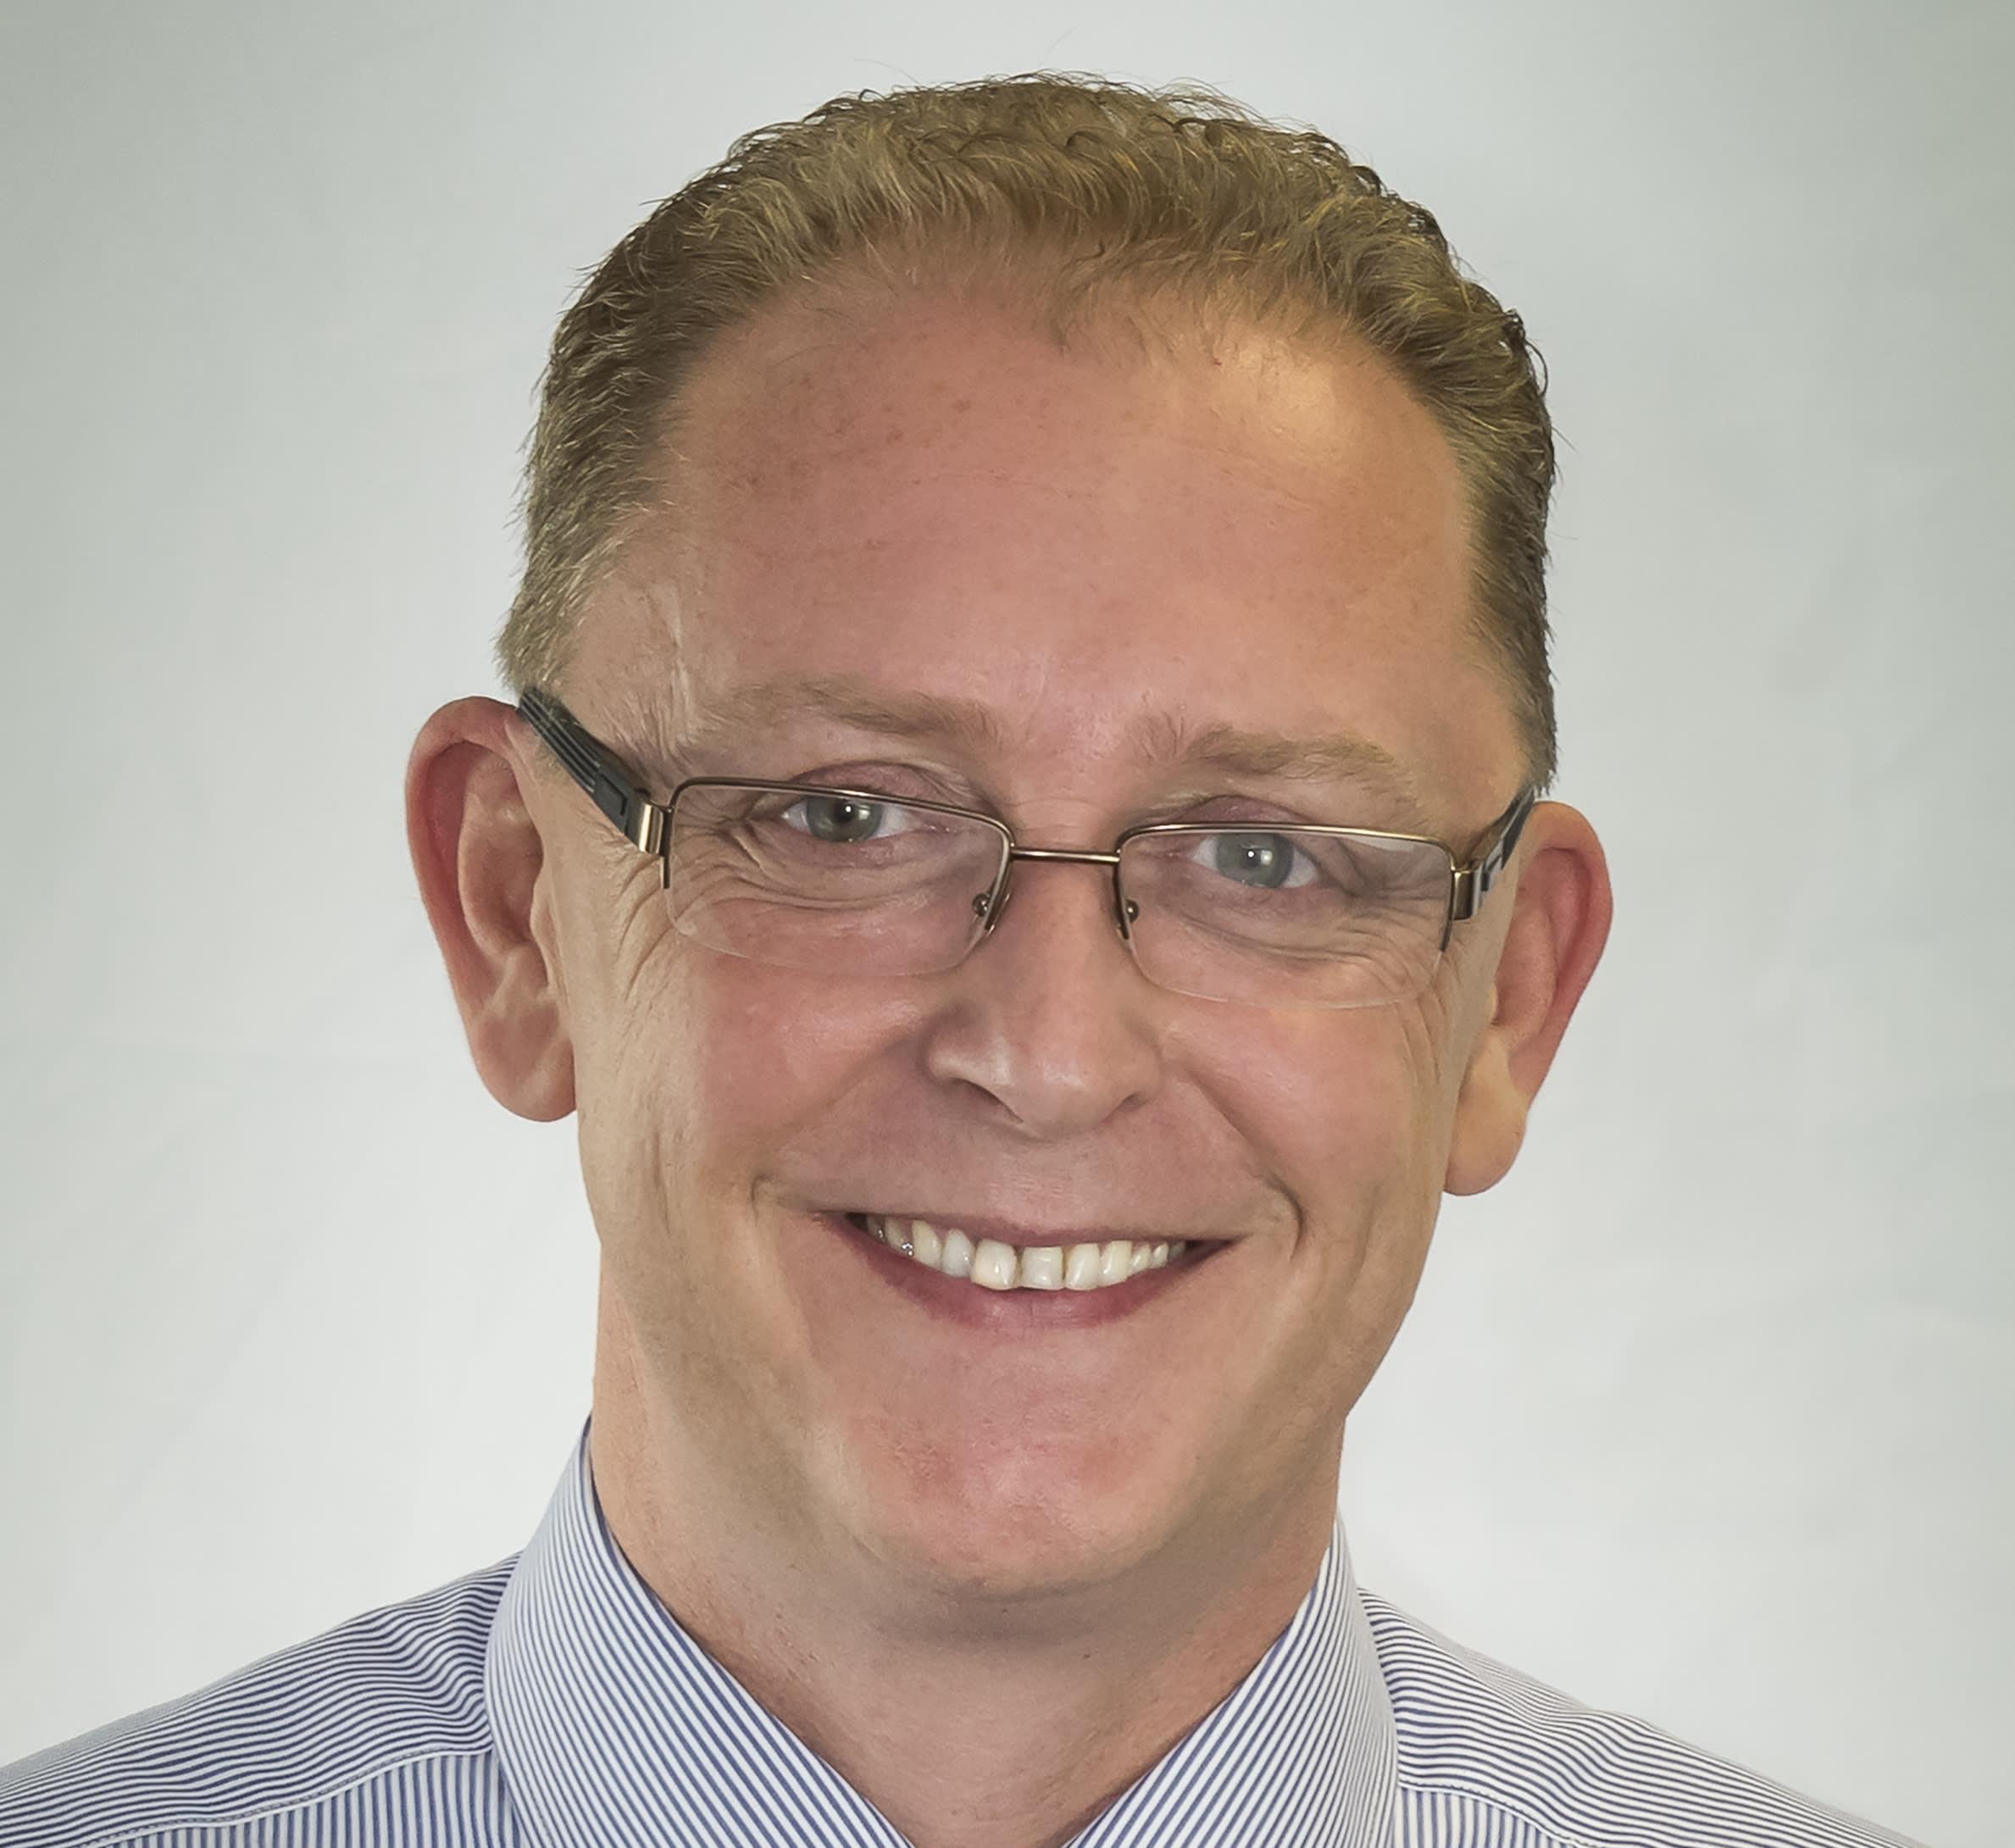 Mortgages for Business promotes Steve Olejnik to MD